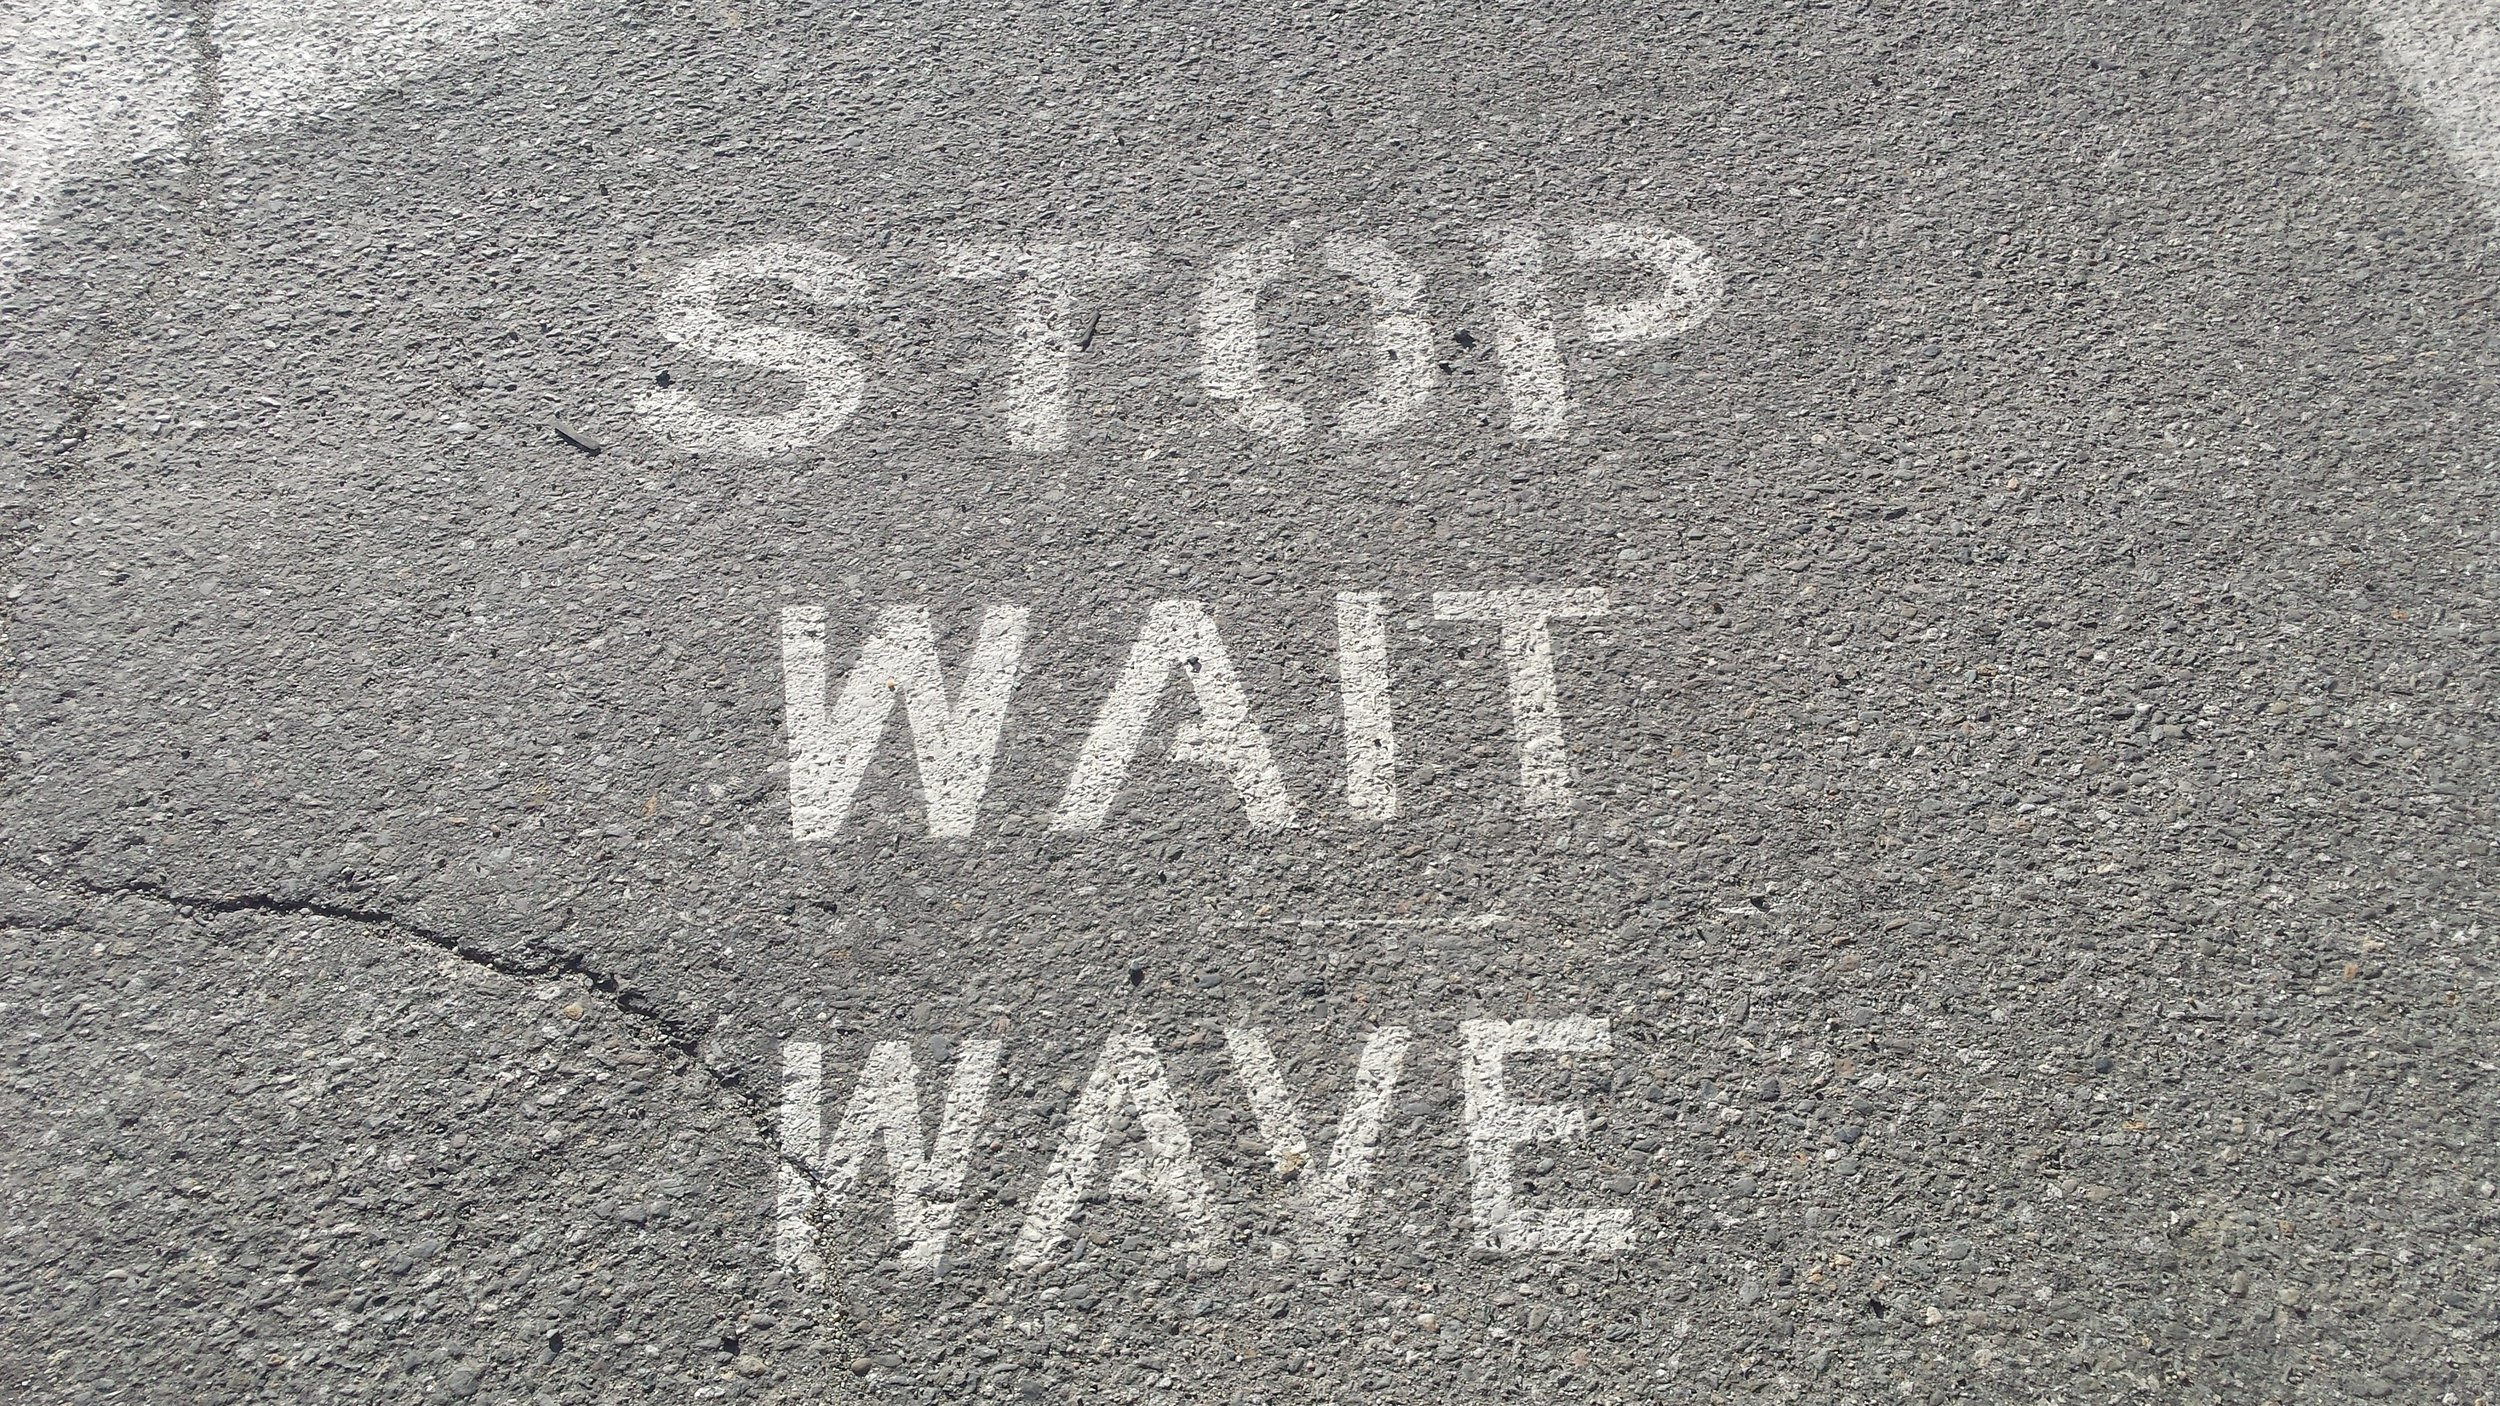 stop-wait-wave.jpg